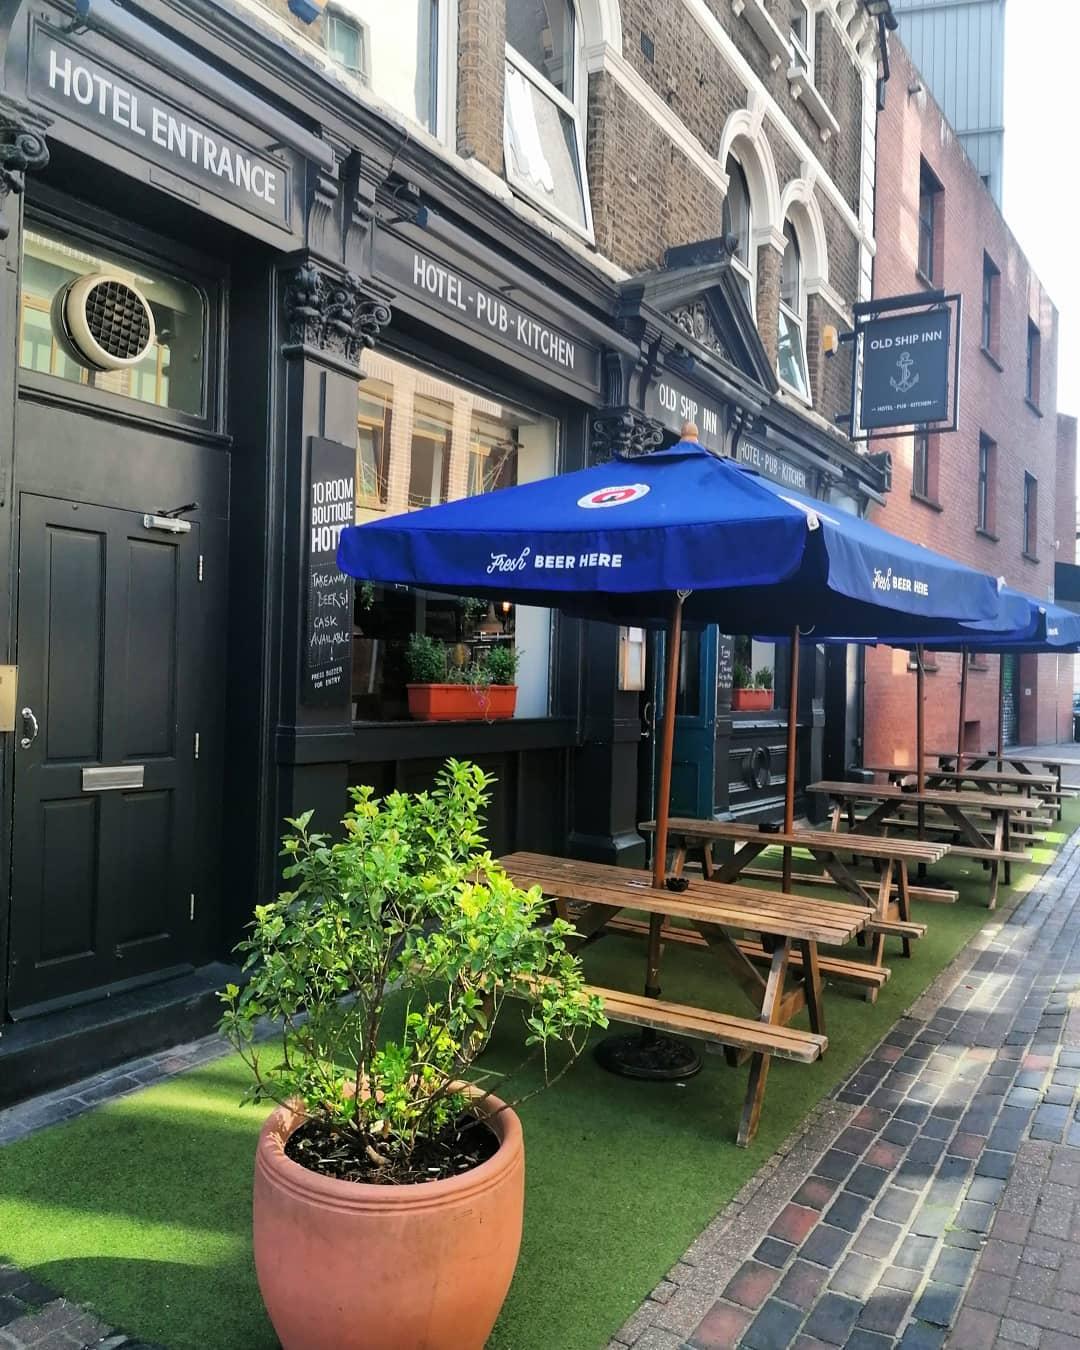 Terrace is open....  #hackneylocal #hackneytownhall #open #hackney #londonvibes #foodie #dalston#stokenewington #craftbeer #cocktails #clapton #pubterrace #goodvibes #beer #beergarden #ales #sunnyday #oldshiphackney